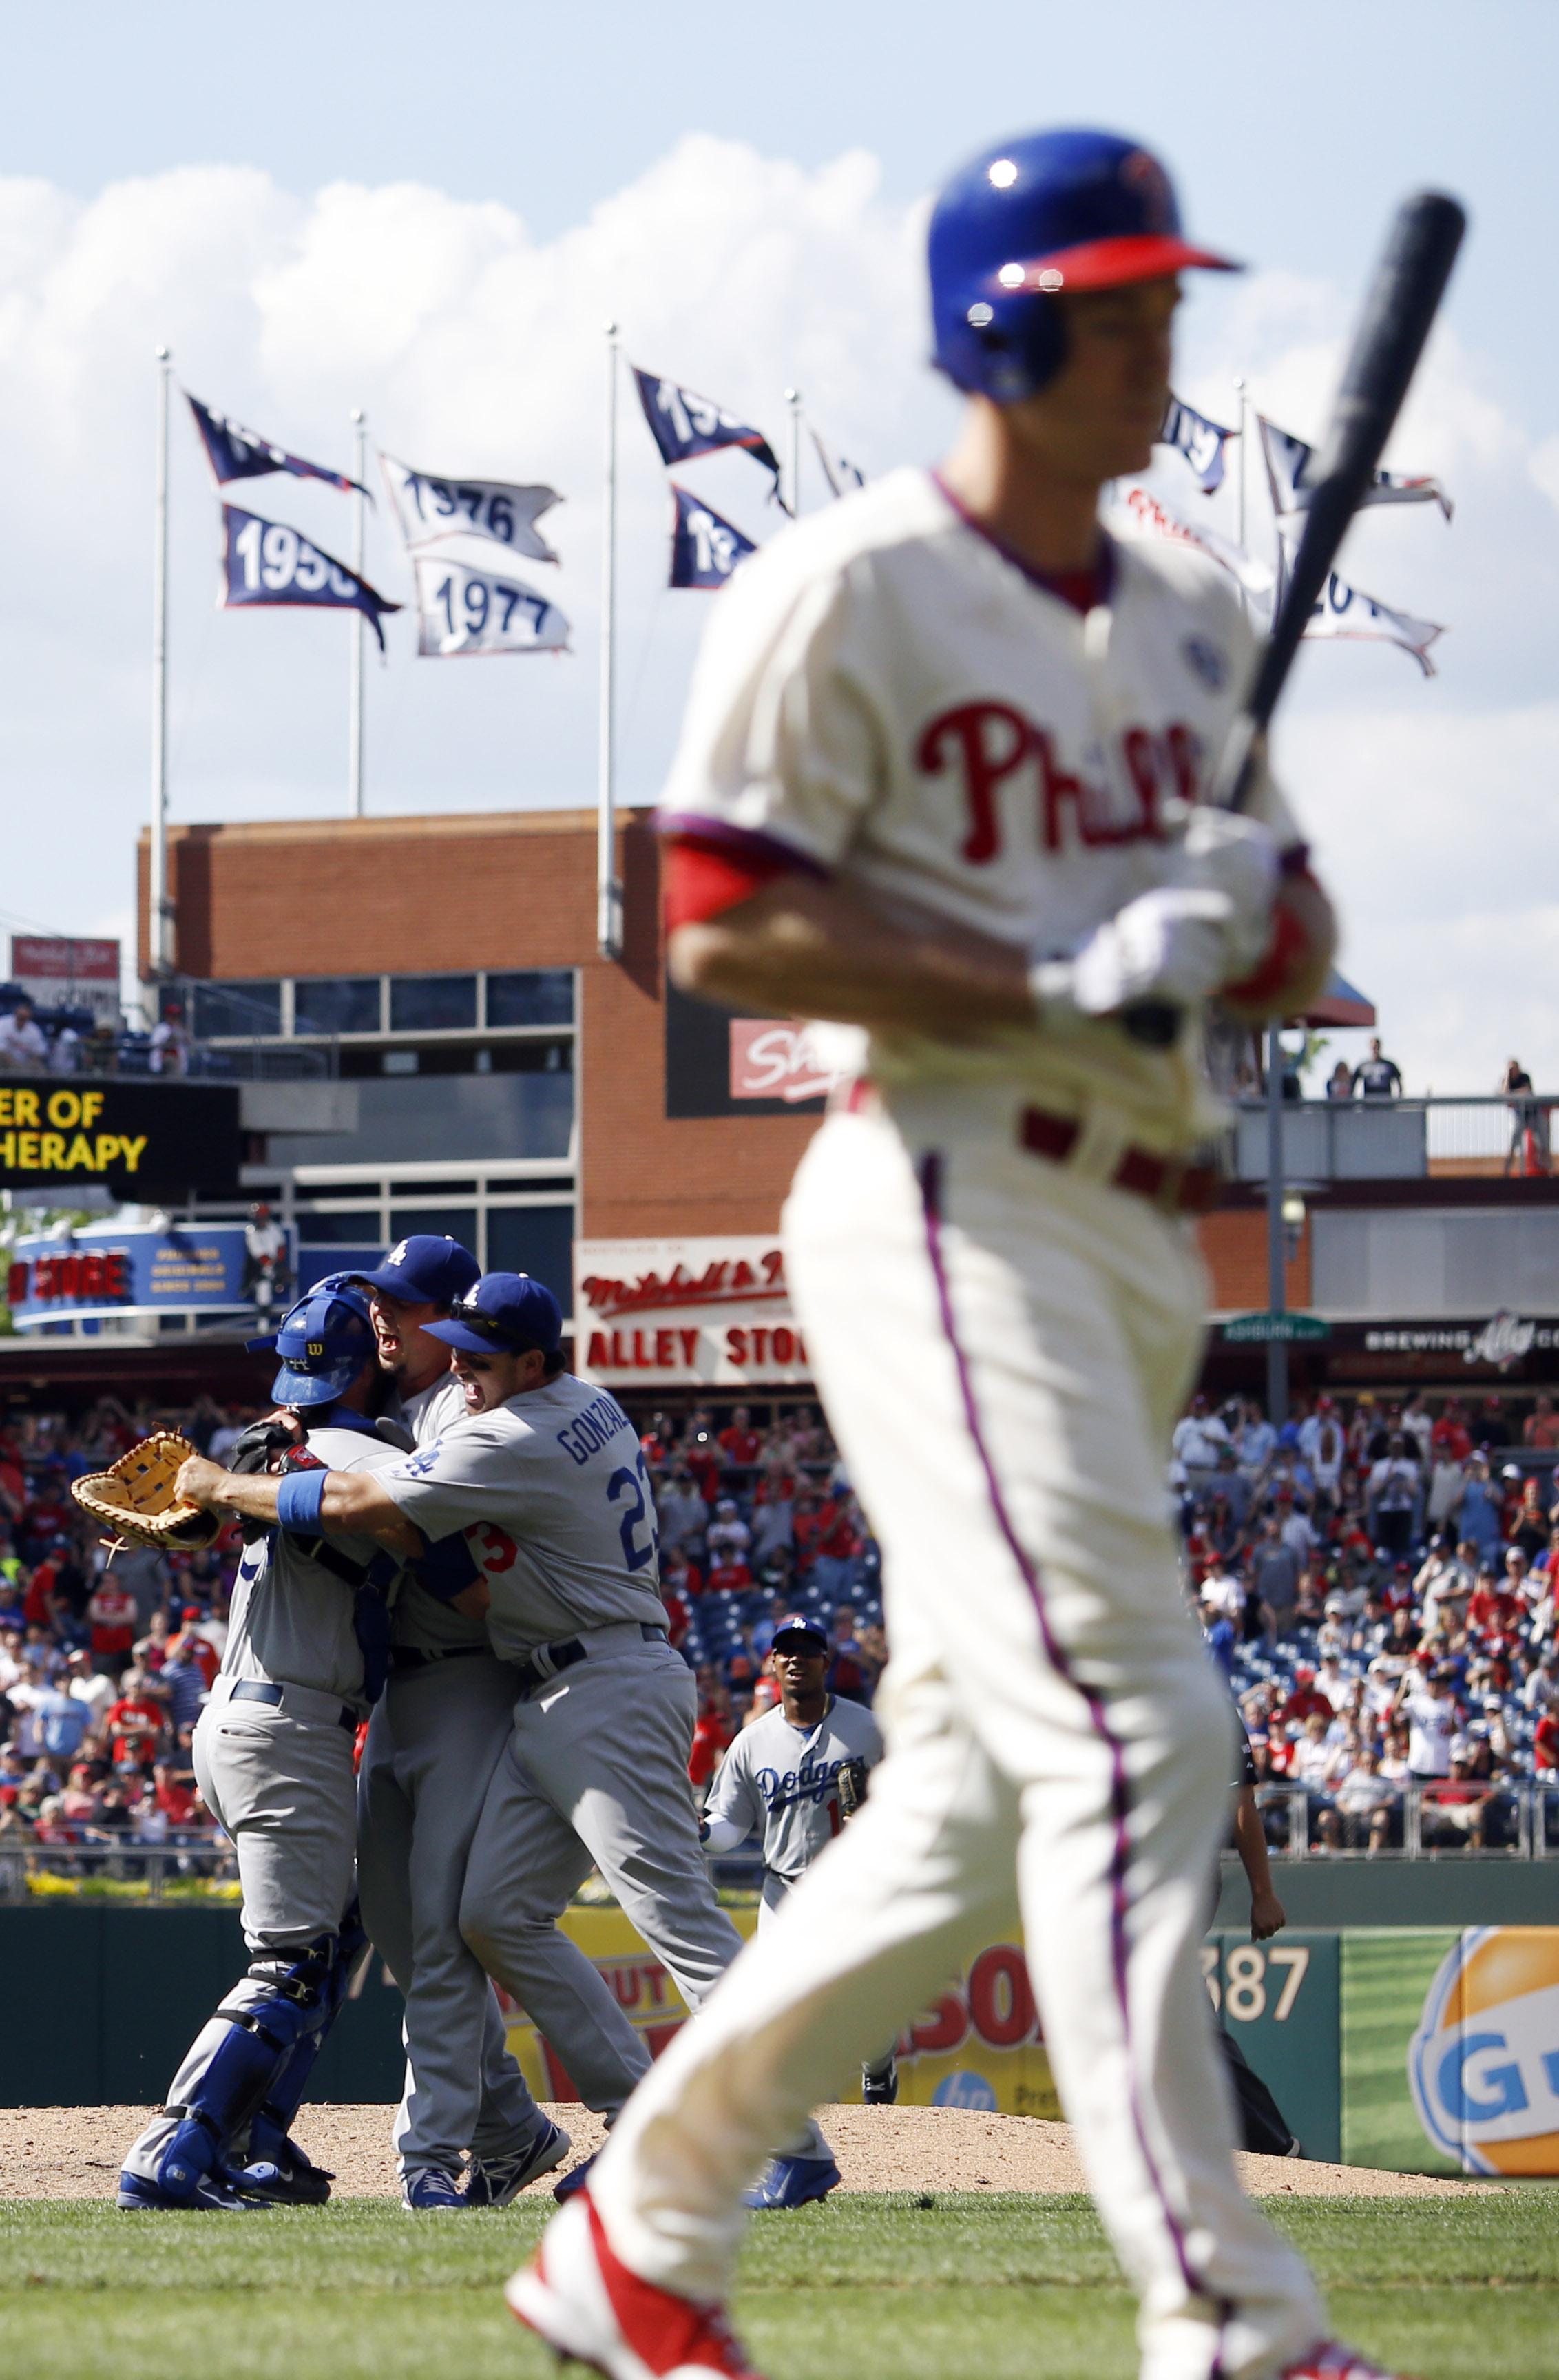 Beckett pitches no-hitter, Dodgers stop Phillies